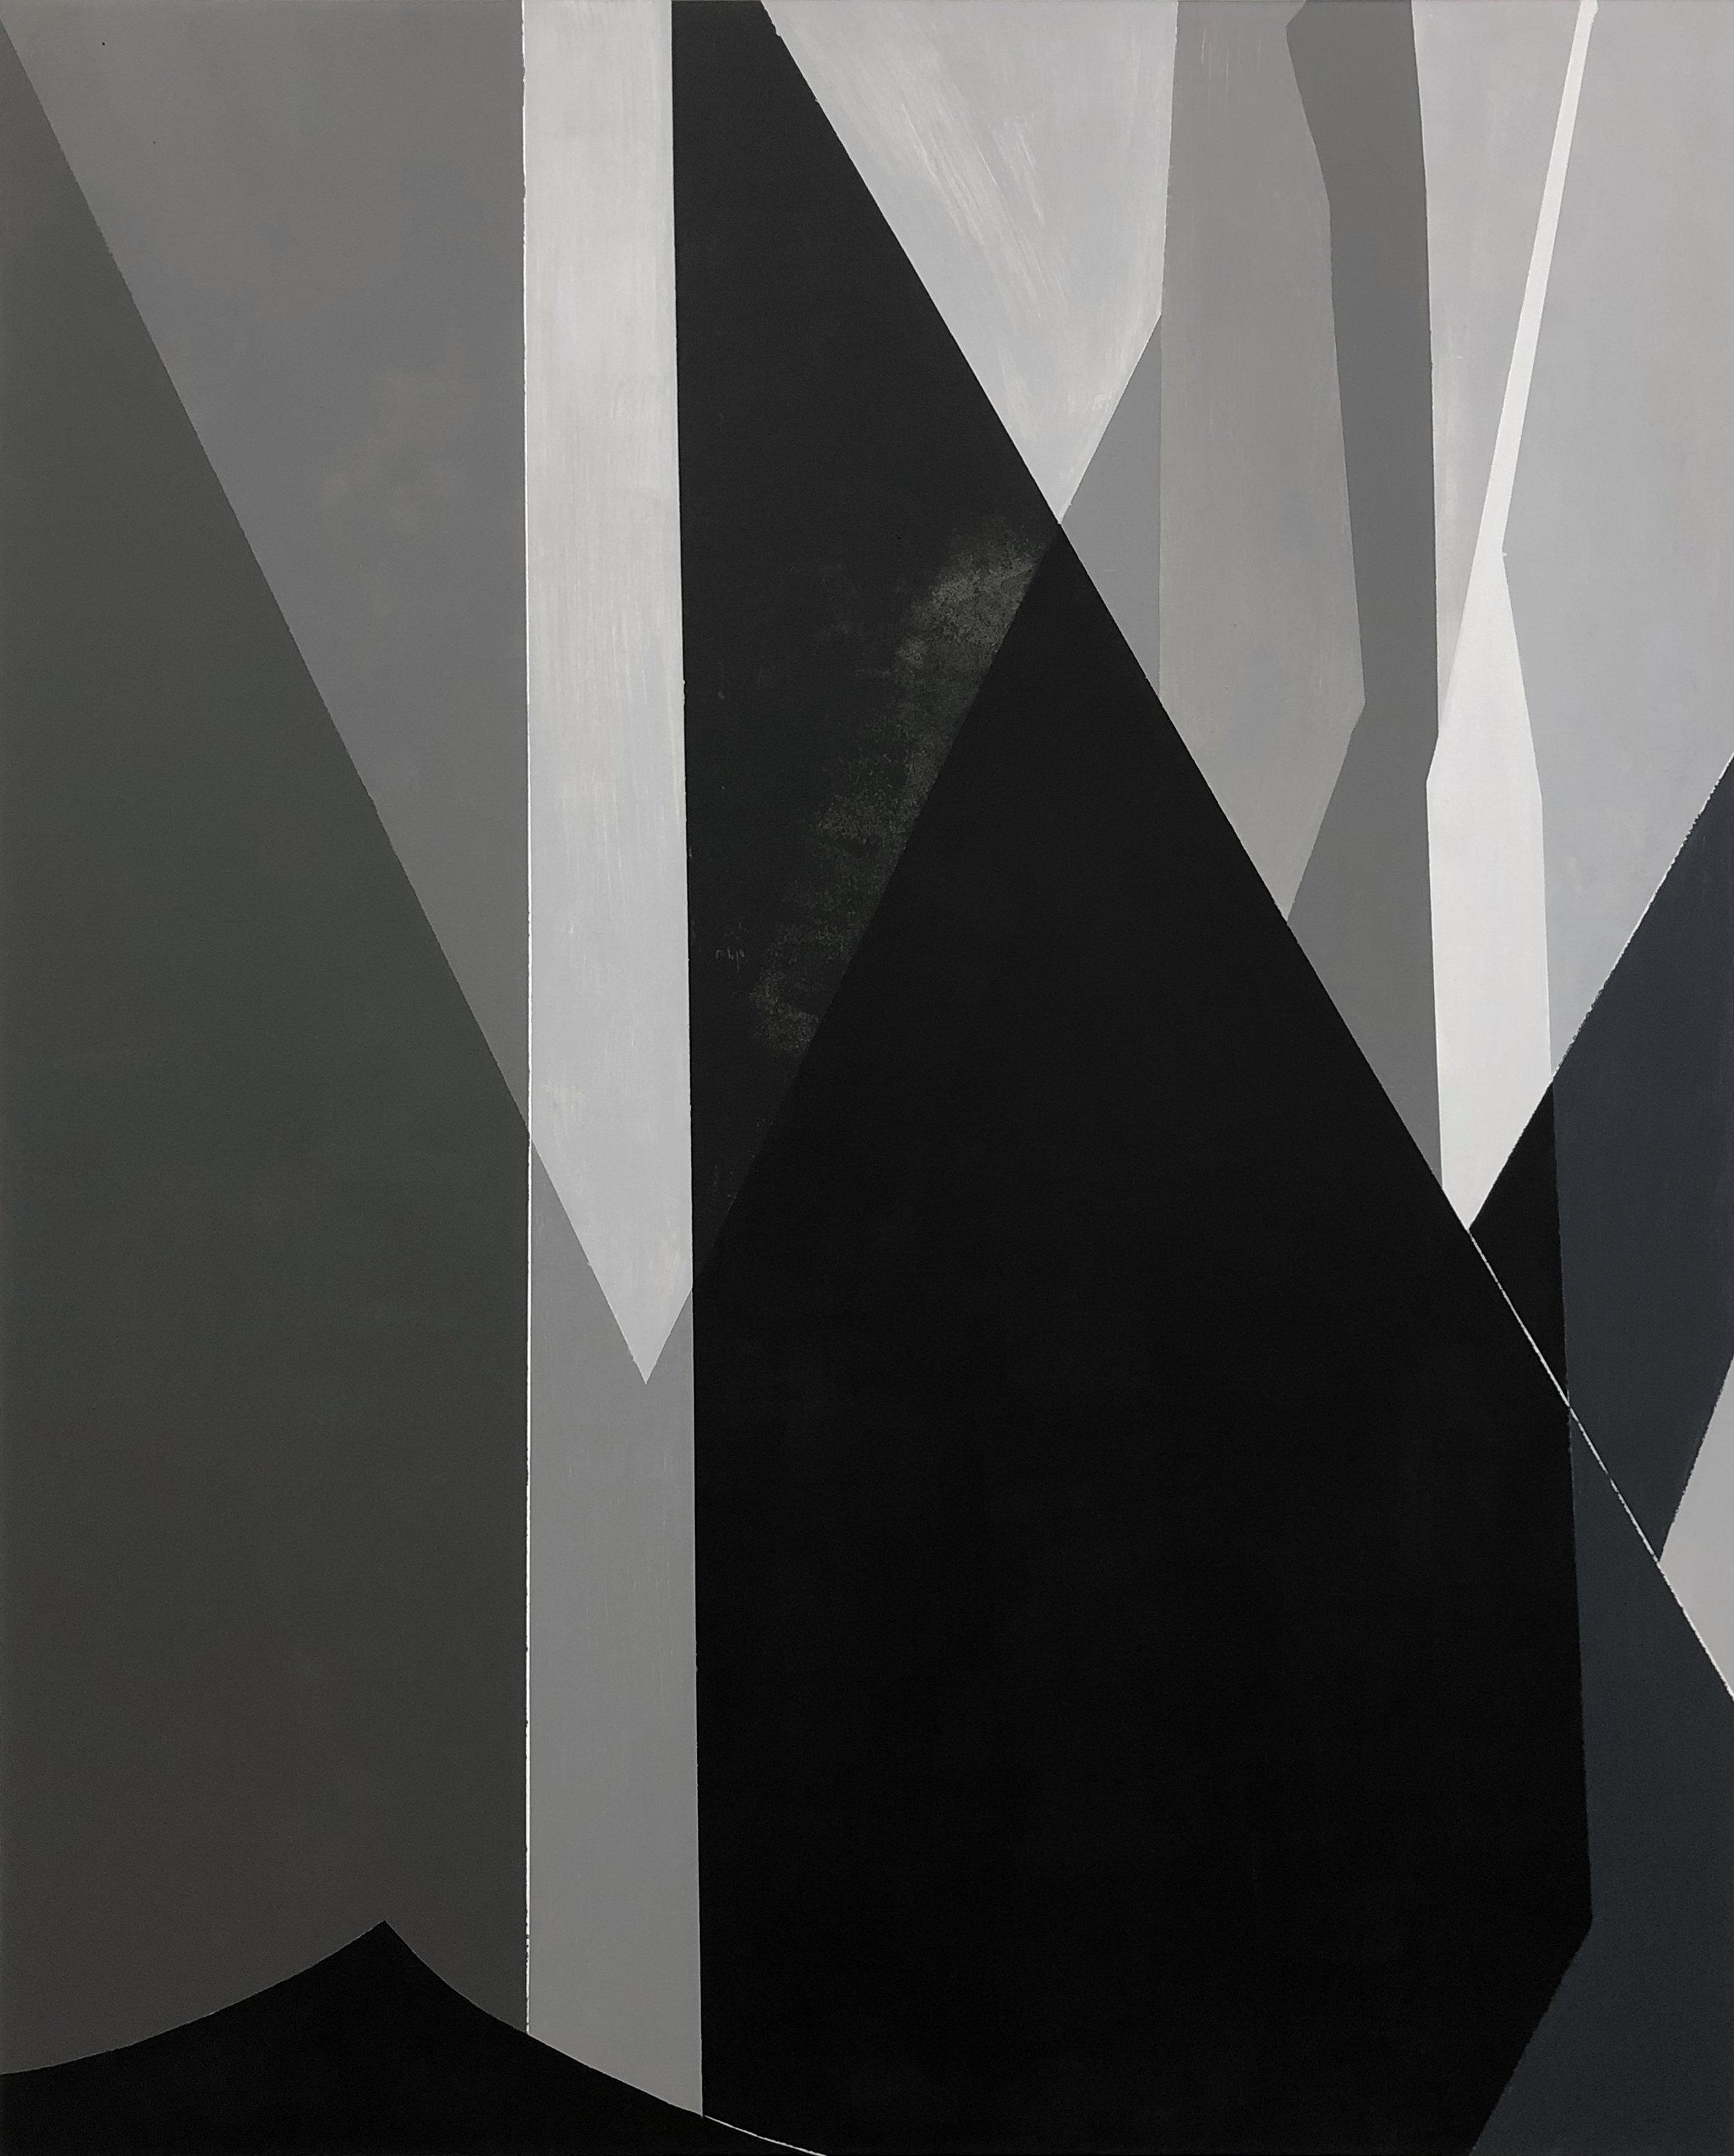 Self-Similar Mountain , 2019 Latex on wood, 60x48 Inches